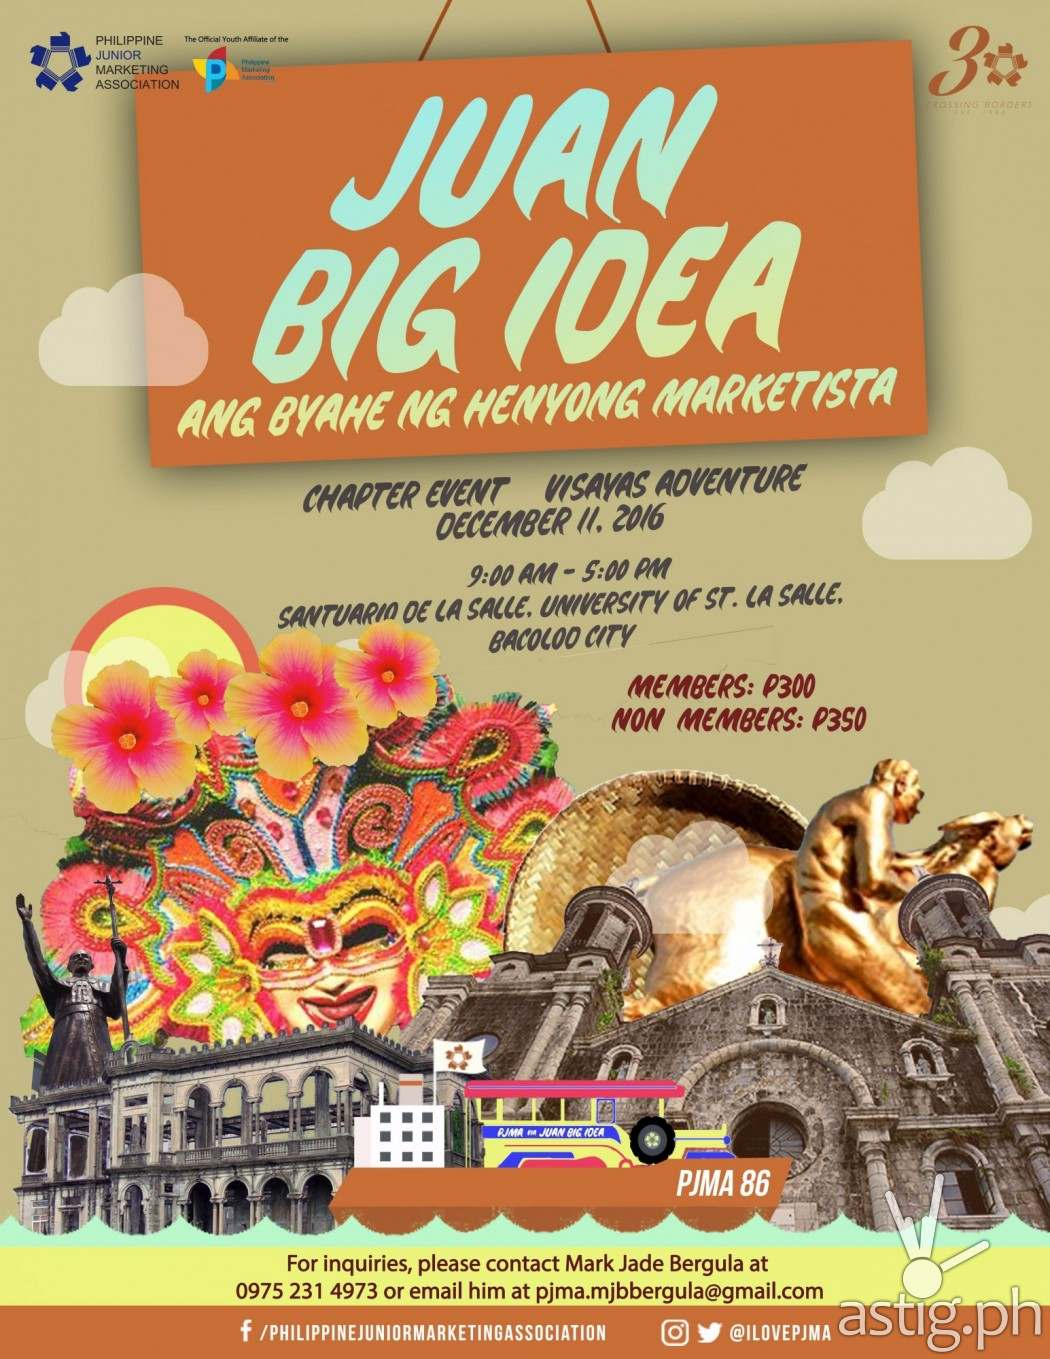 http://astig.ph/wp-content/uploads/2016/12/Juan-Big-Idea-Visayas-1050x1359.jpg